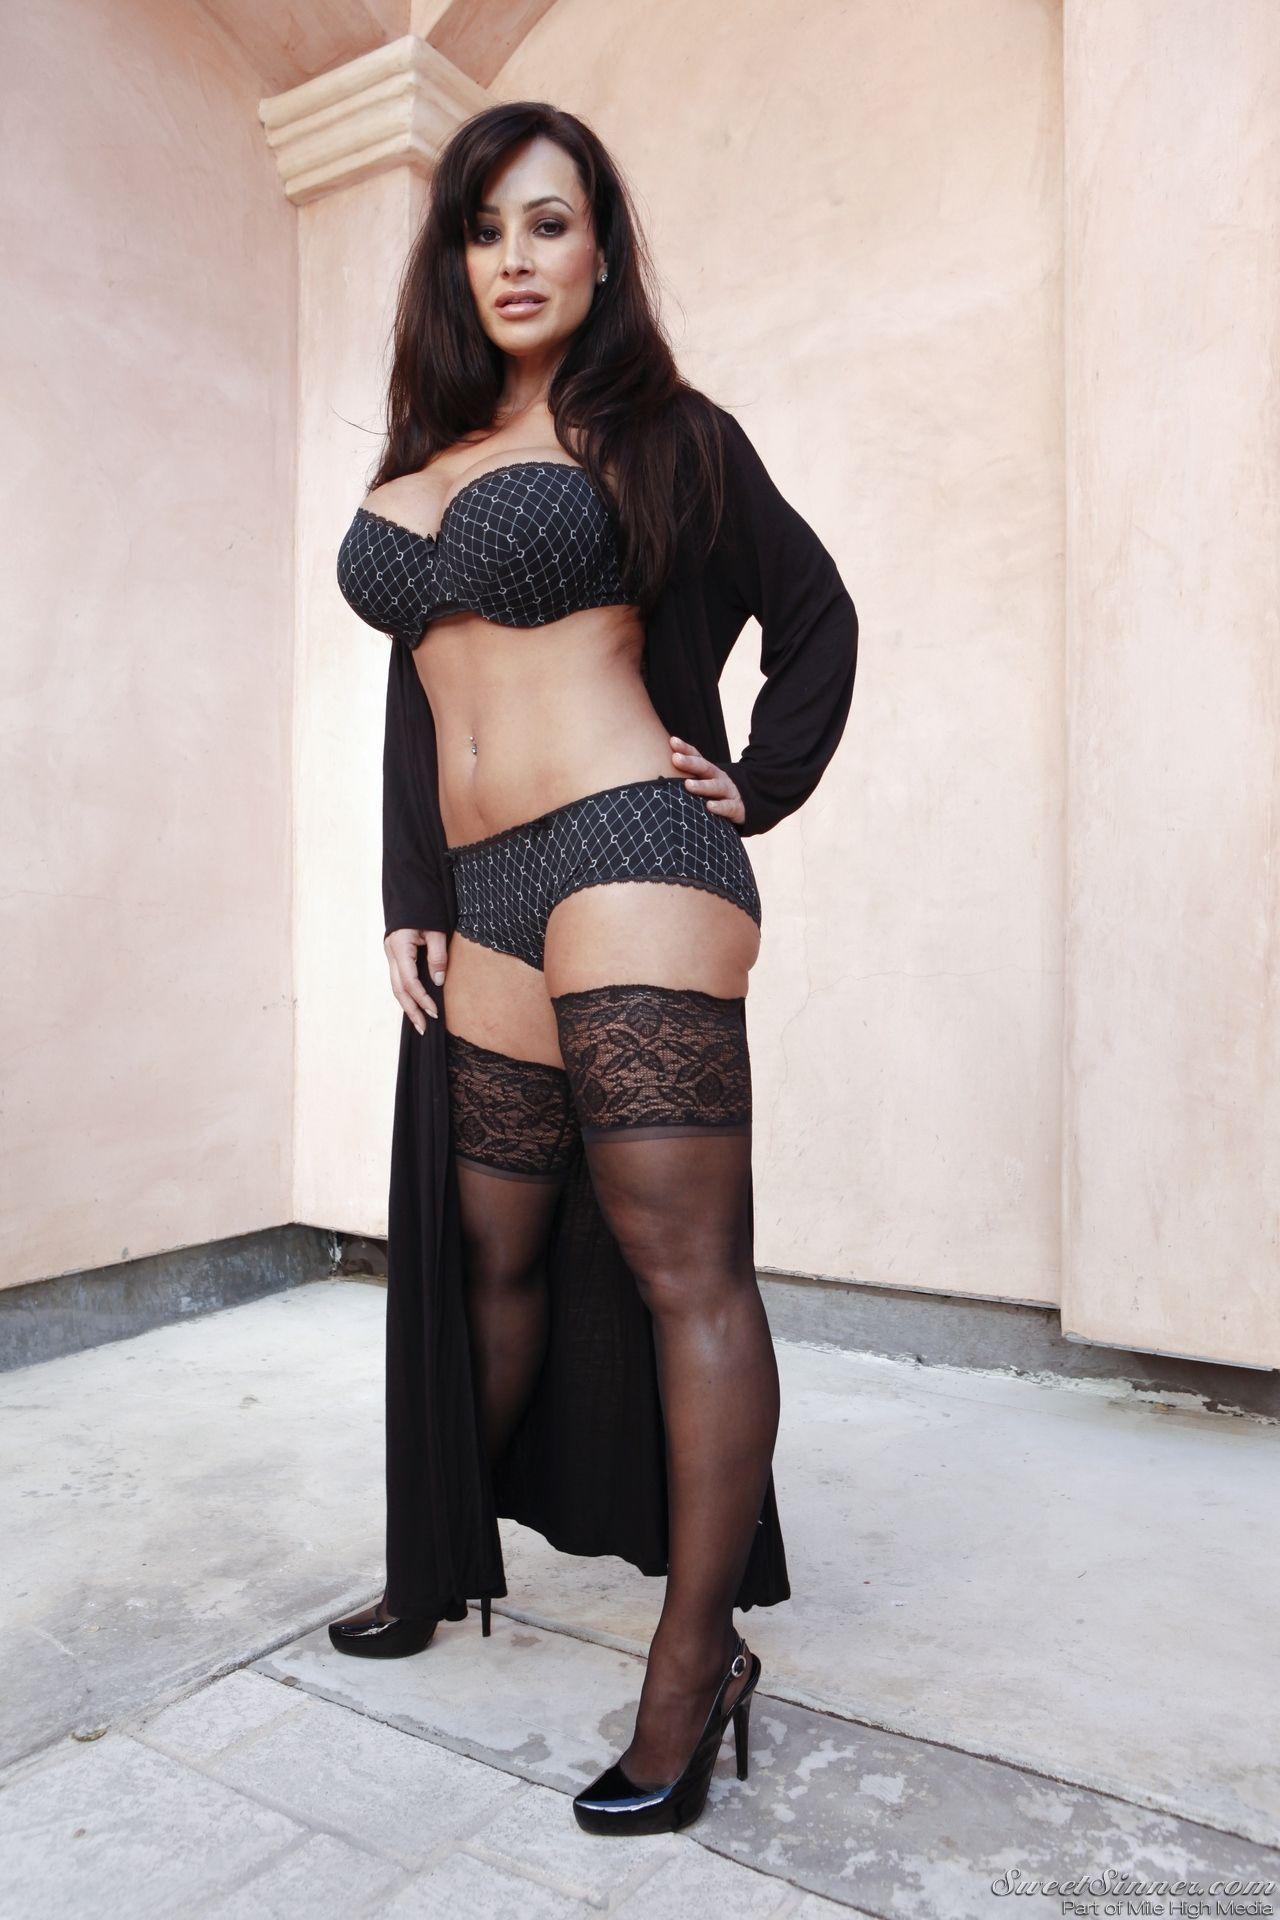 lisa ann stocking